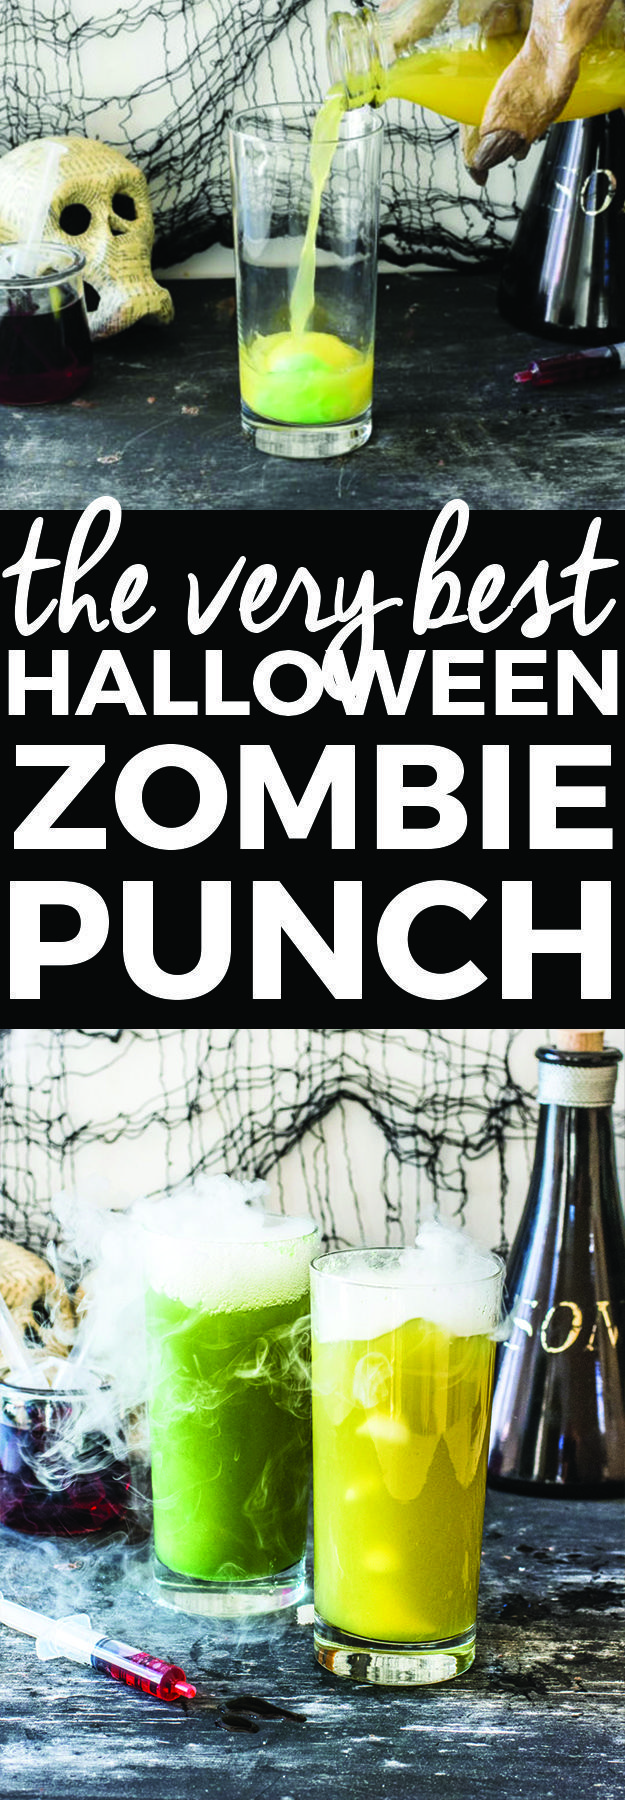 Halloween Zombie Punch Recipe   halloween recipes, halloween punch recipes, halloween drink recipes, family friendly halloween drinks, non-alcoholic halloween drinks, halloween party recipes, zombie recipe ideas, #halloweendrinks    The Butter Half via @thebutterhalf